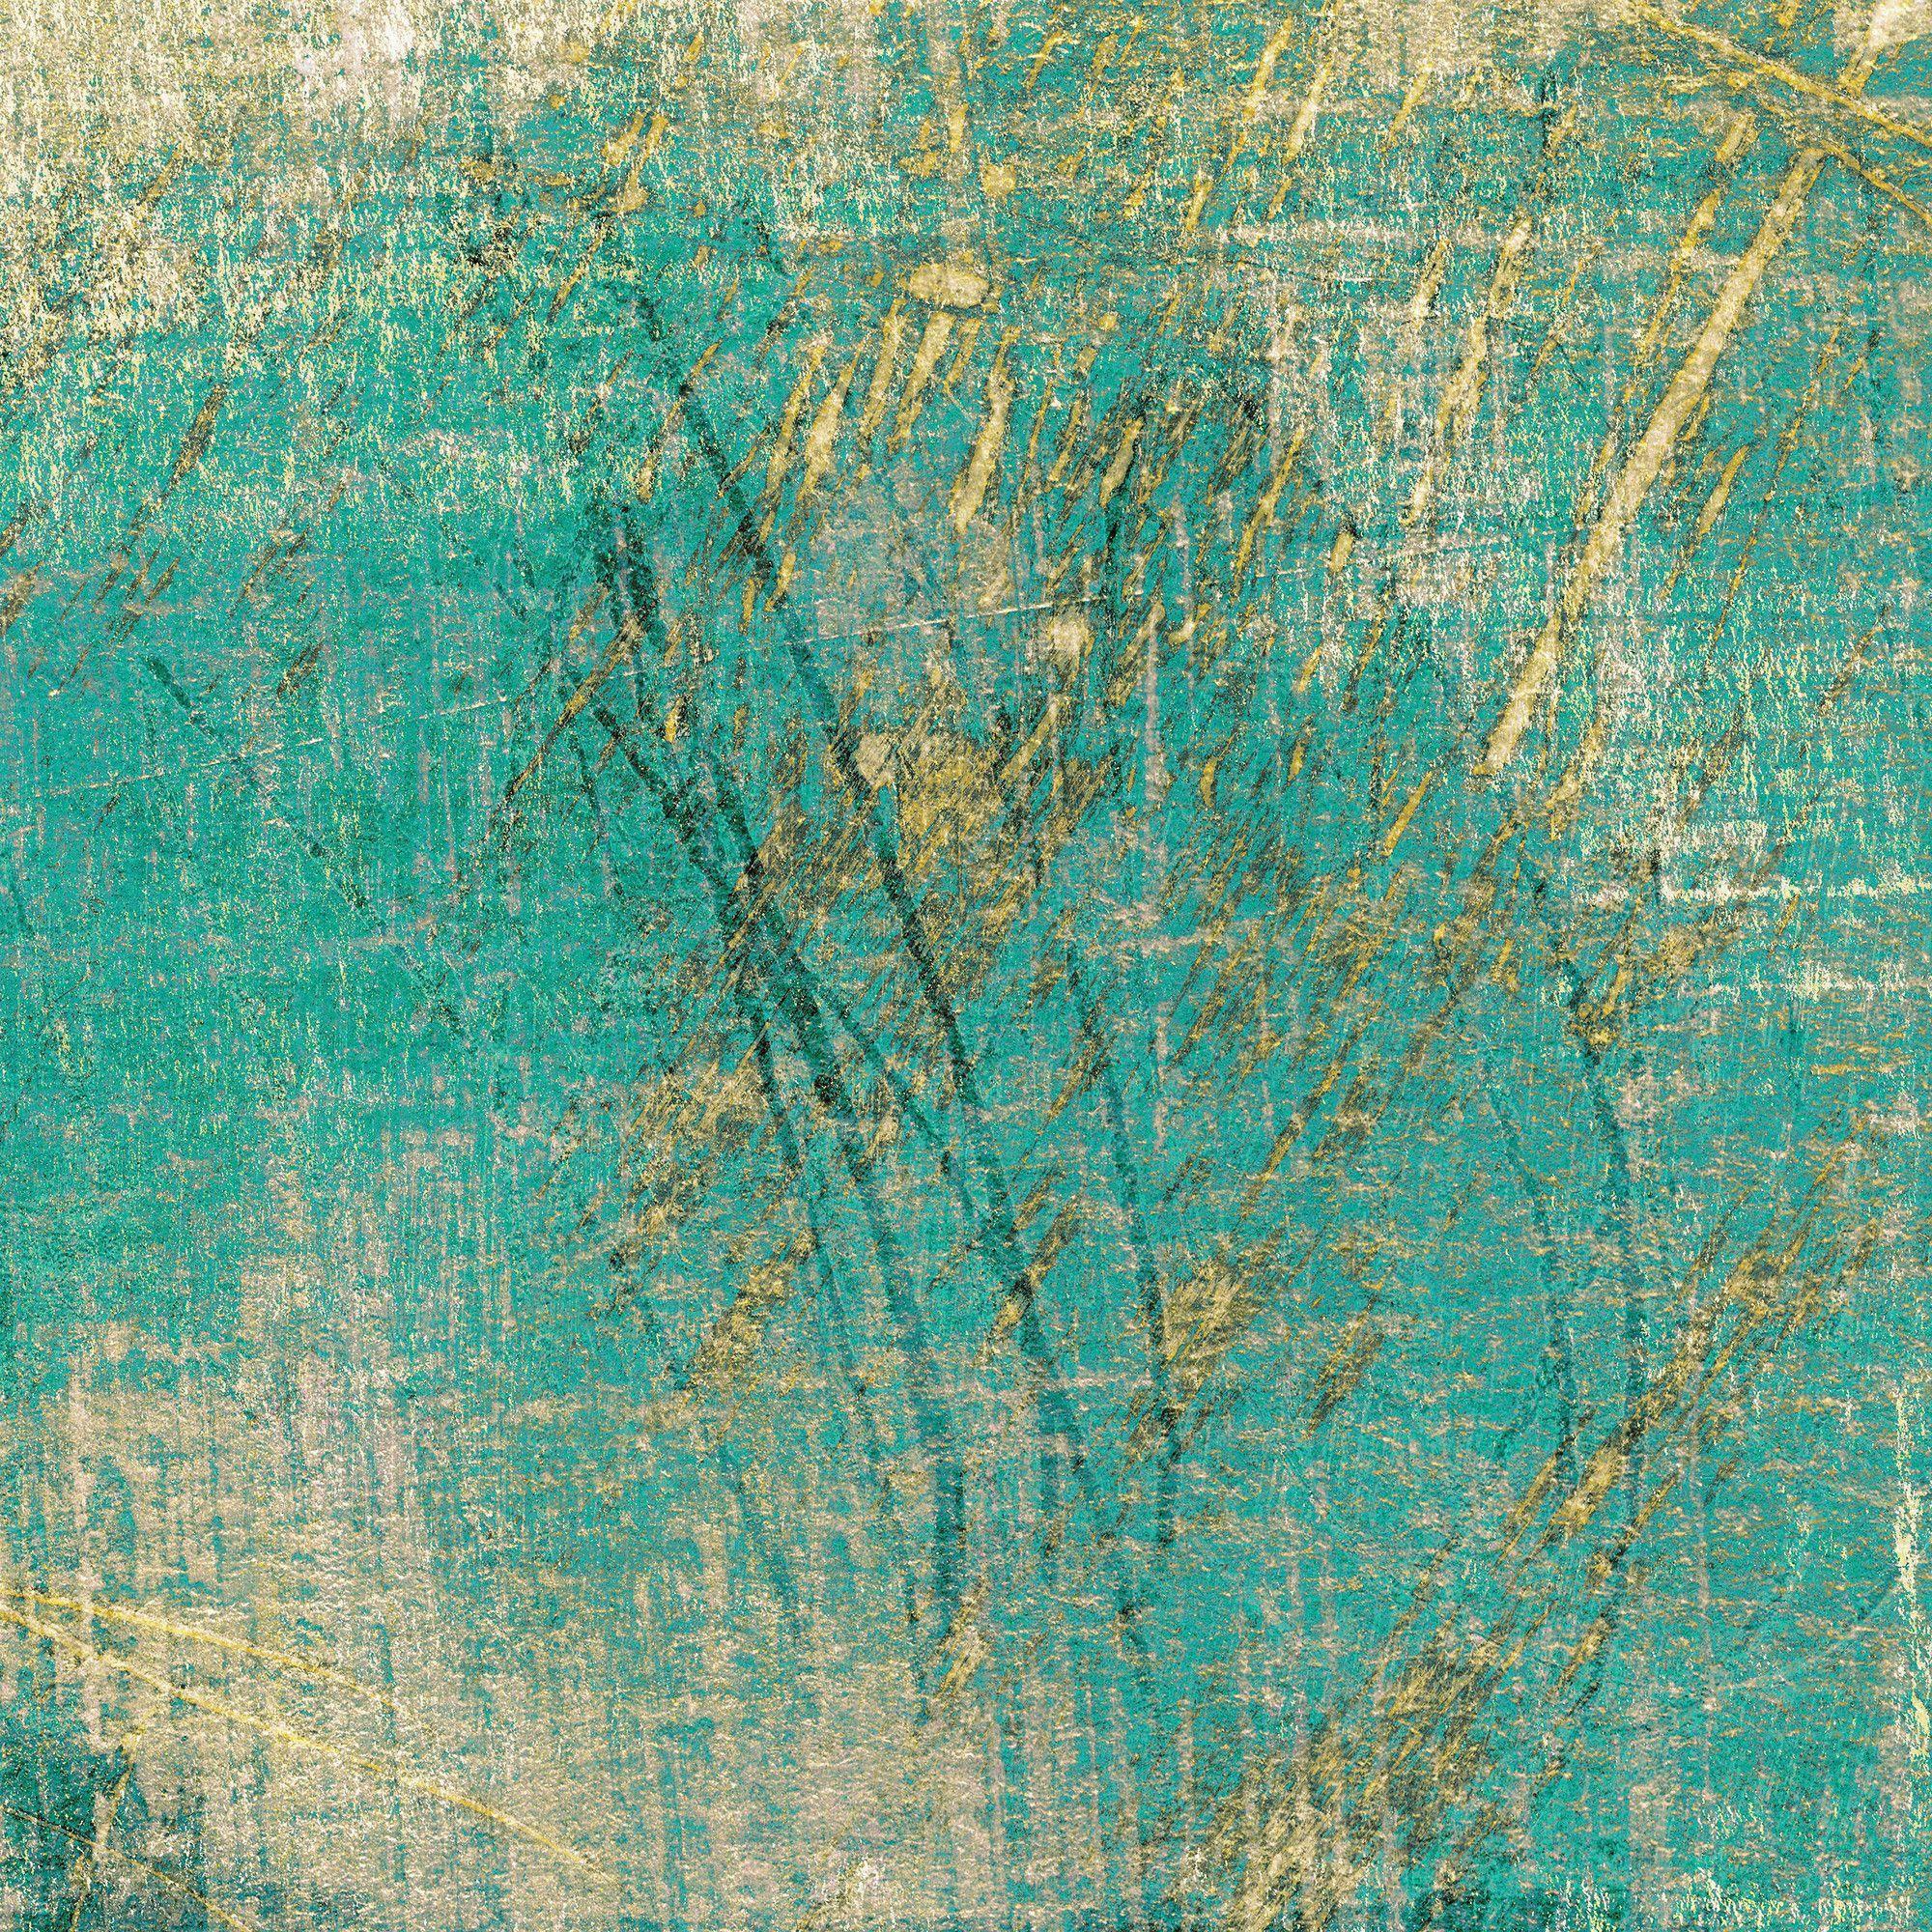 Analog I By Sia Aryai Painting Print On Wrapped Canvas Painting Painting Prints Paintings Prints